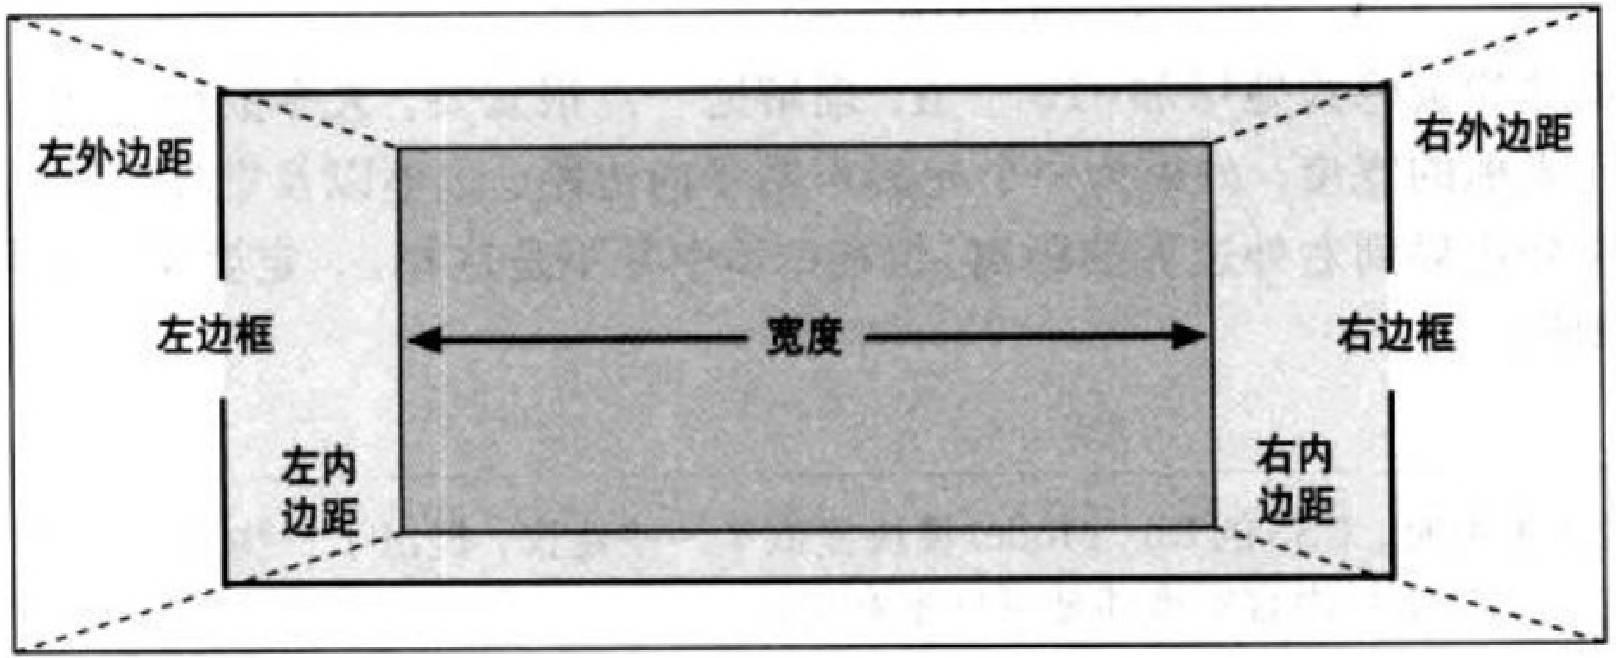 horizontalFormate